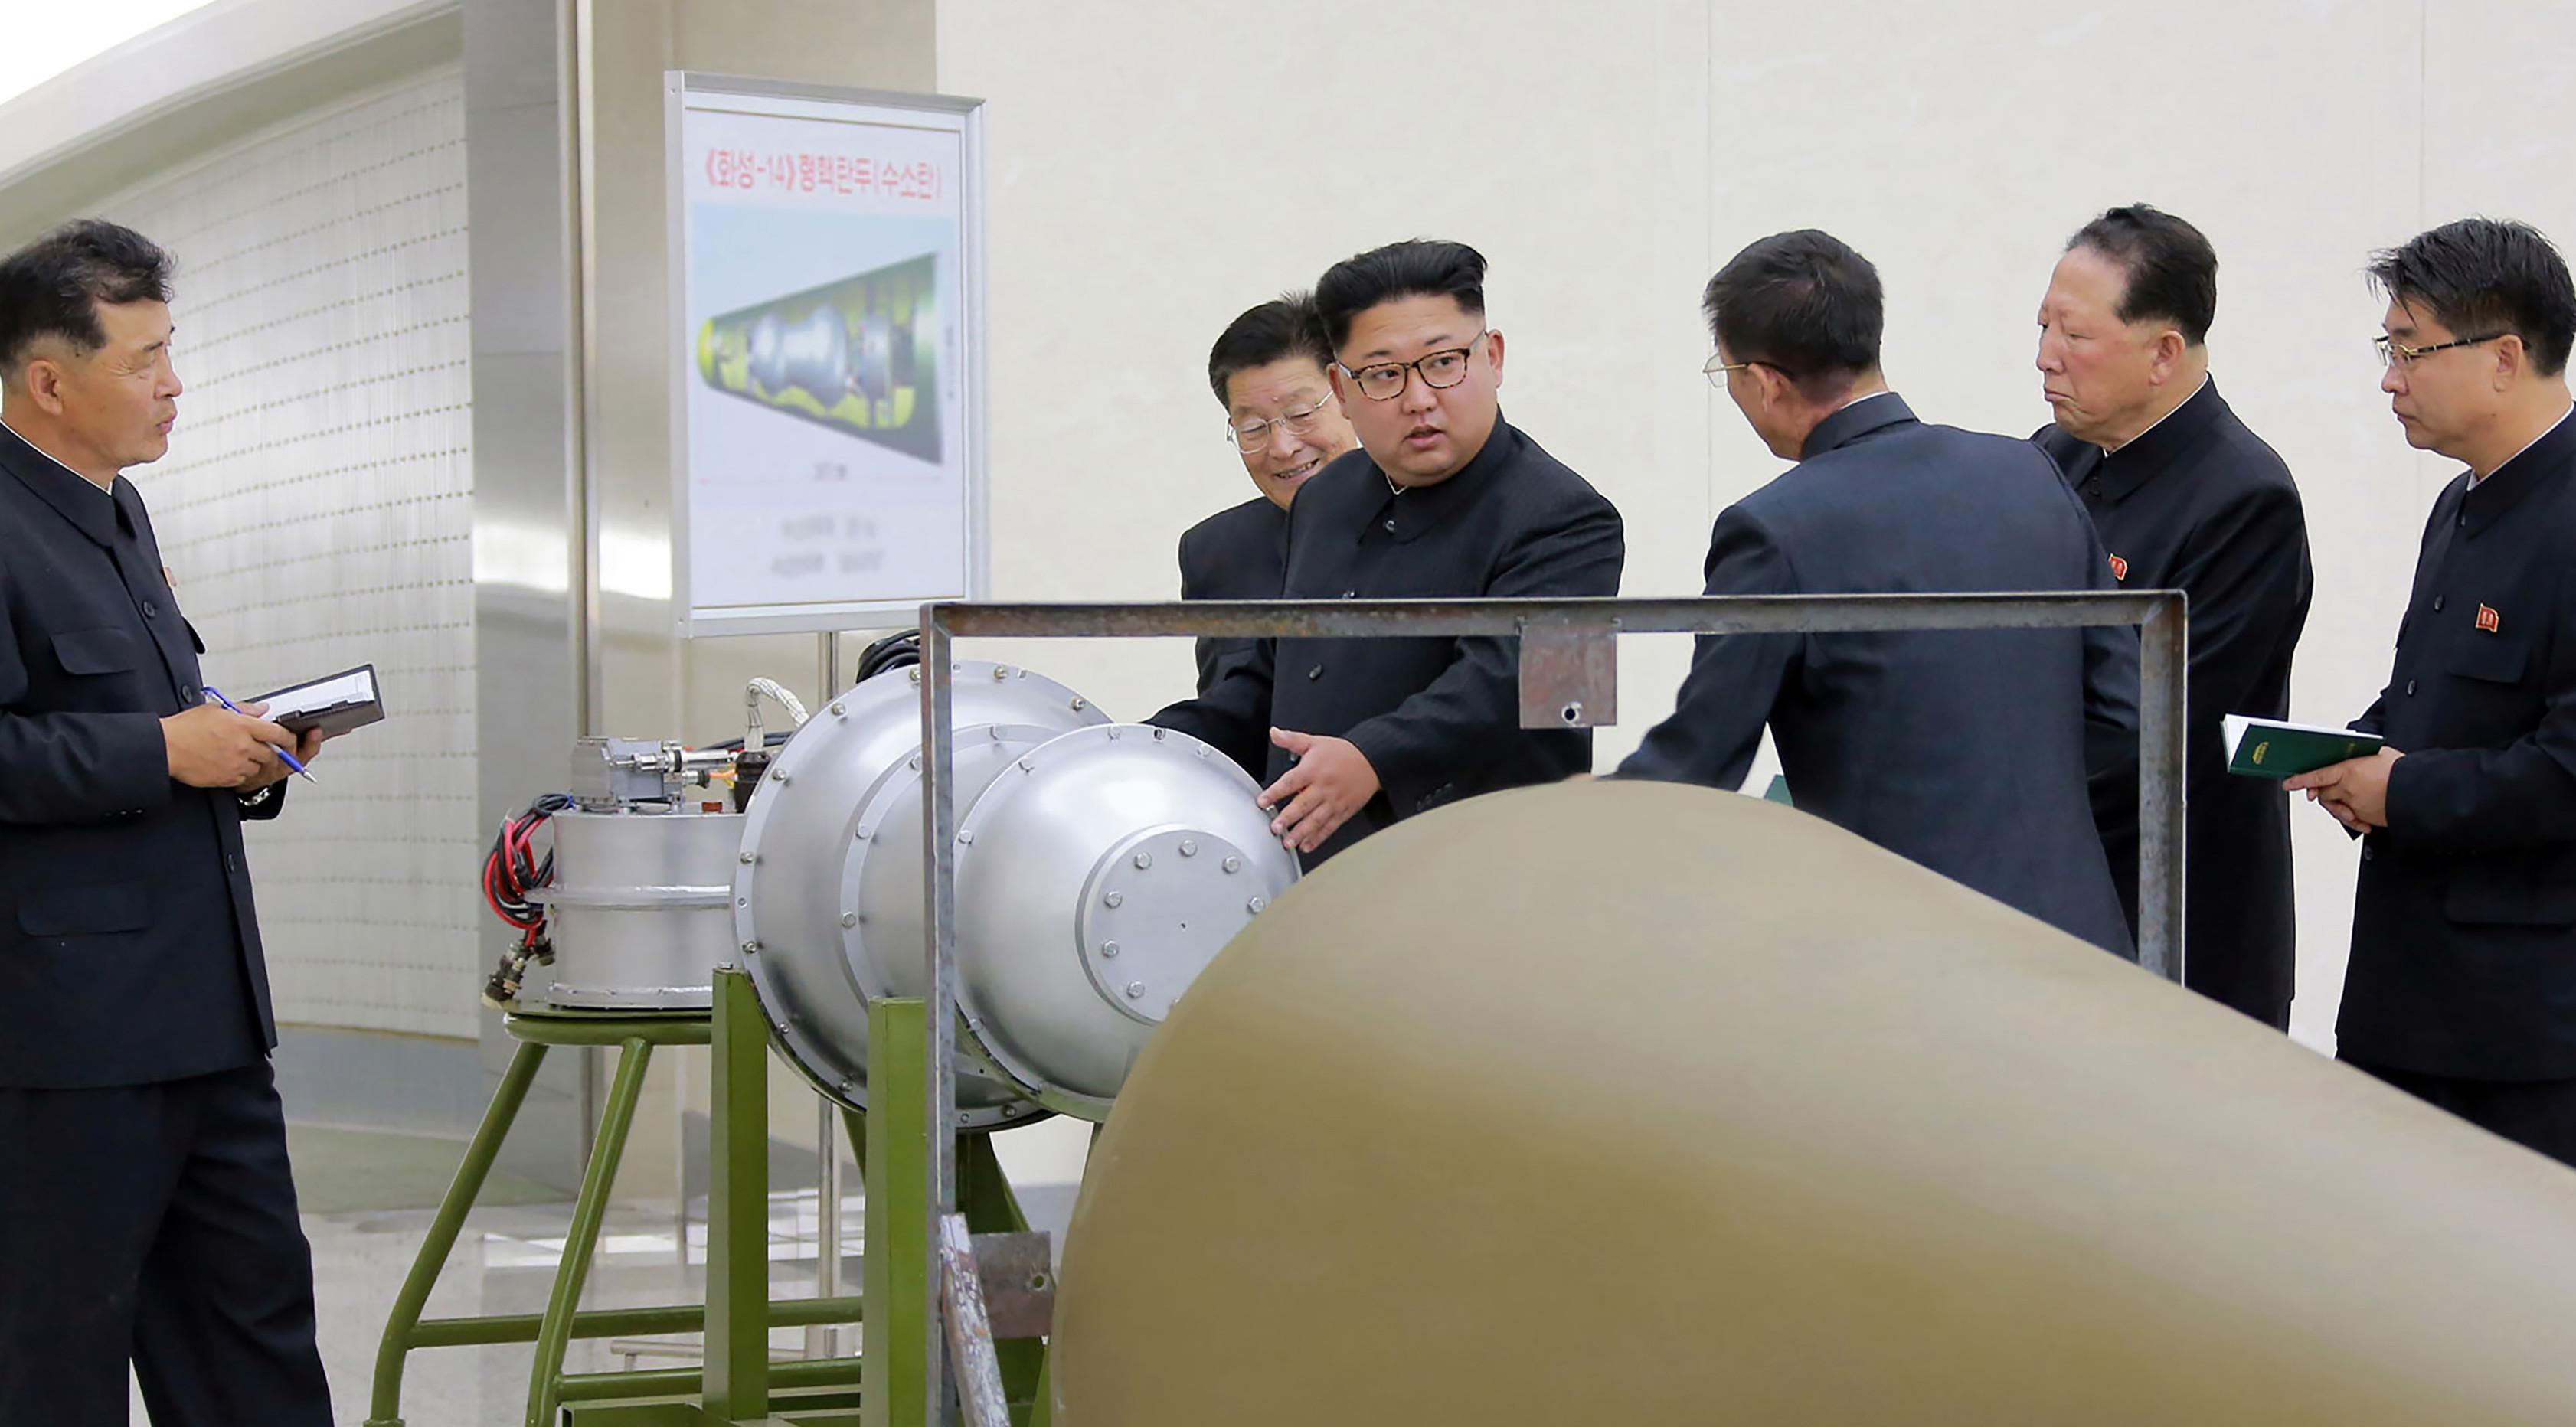 Foto yang dirilis kantor berita Korea Utara (KCNA) di Pyongyang menunjukkan pemimpin Korea Utara, Kim Jong-un meninjau pembuatan bom hidrogen yang dapat dimasukkan ke dalam rudal balistik antarbenua pada 3 September 2017. (AFP Photo/Kcna Via Kns/Str)